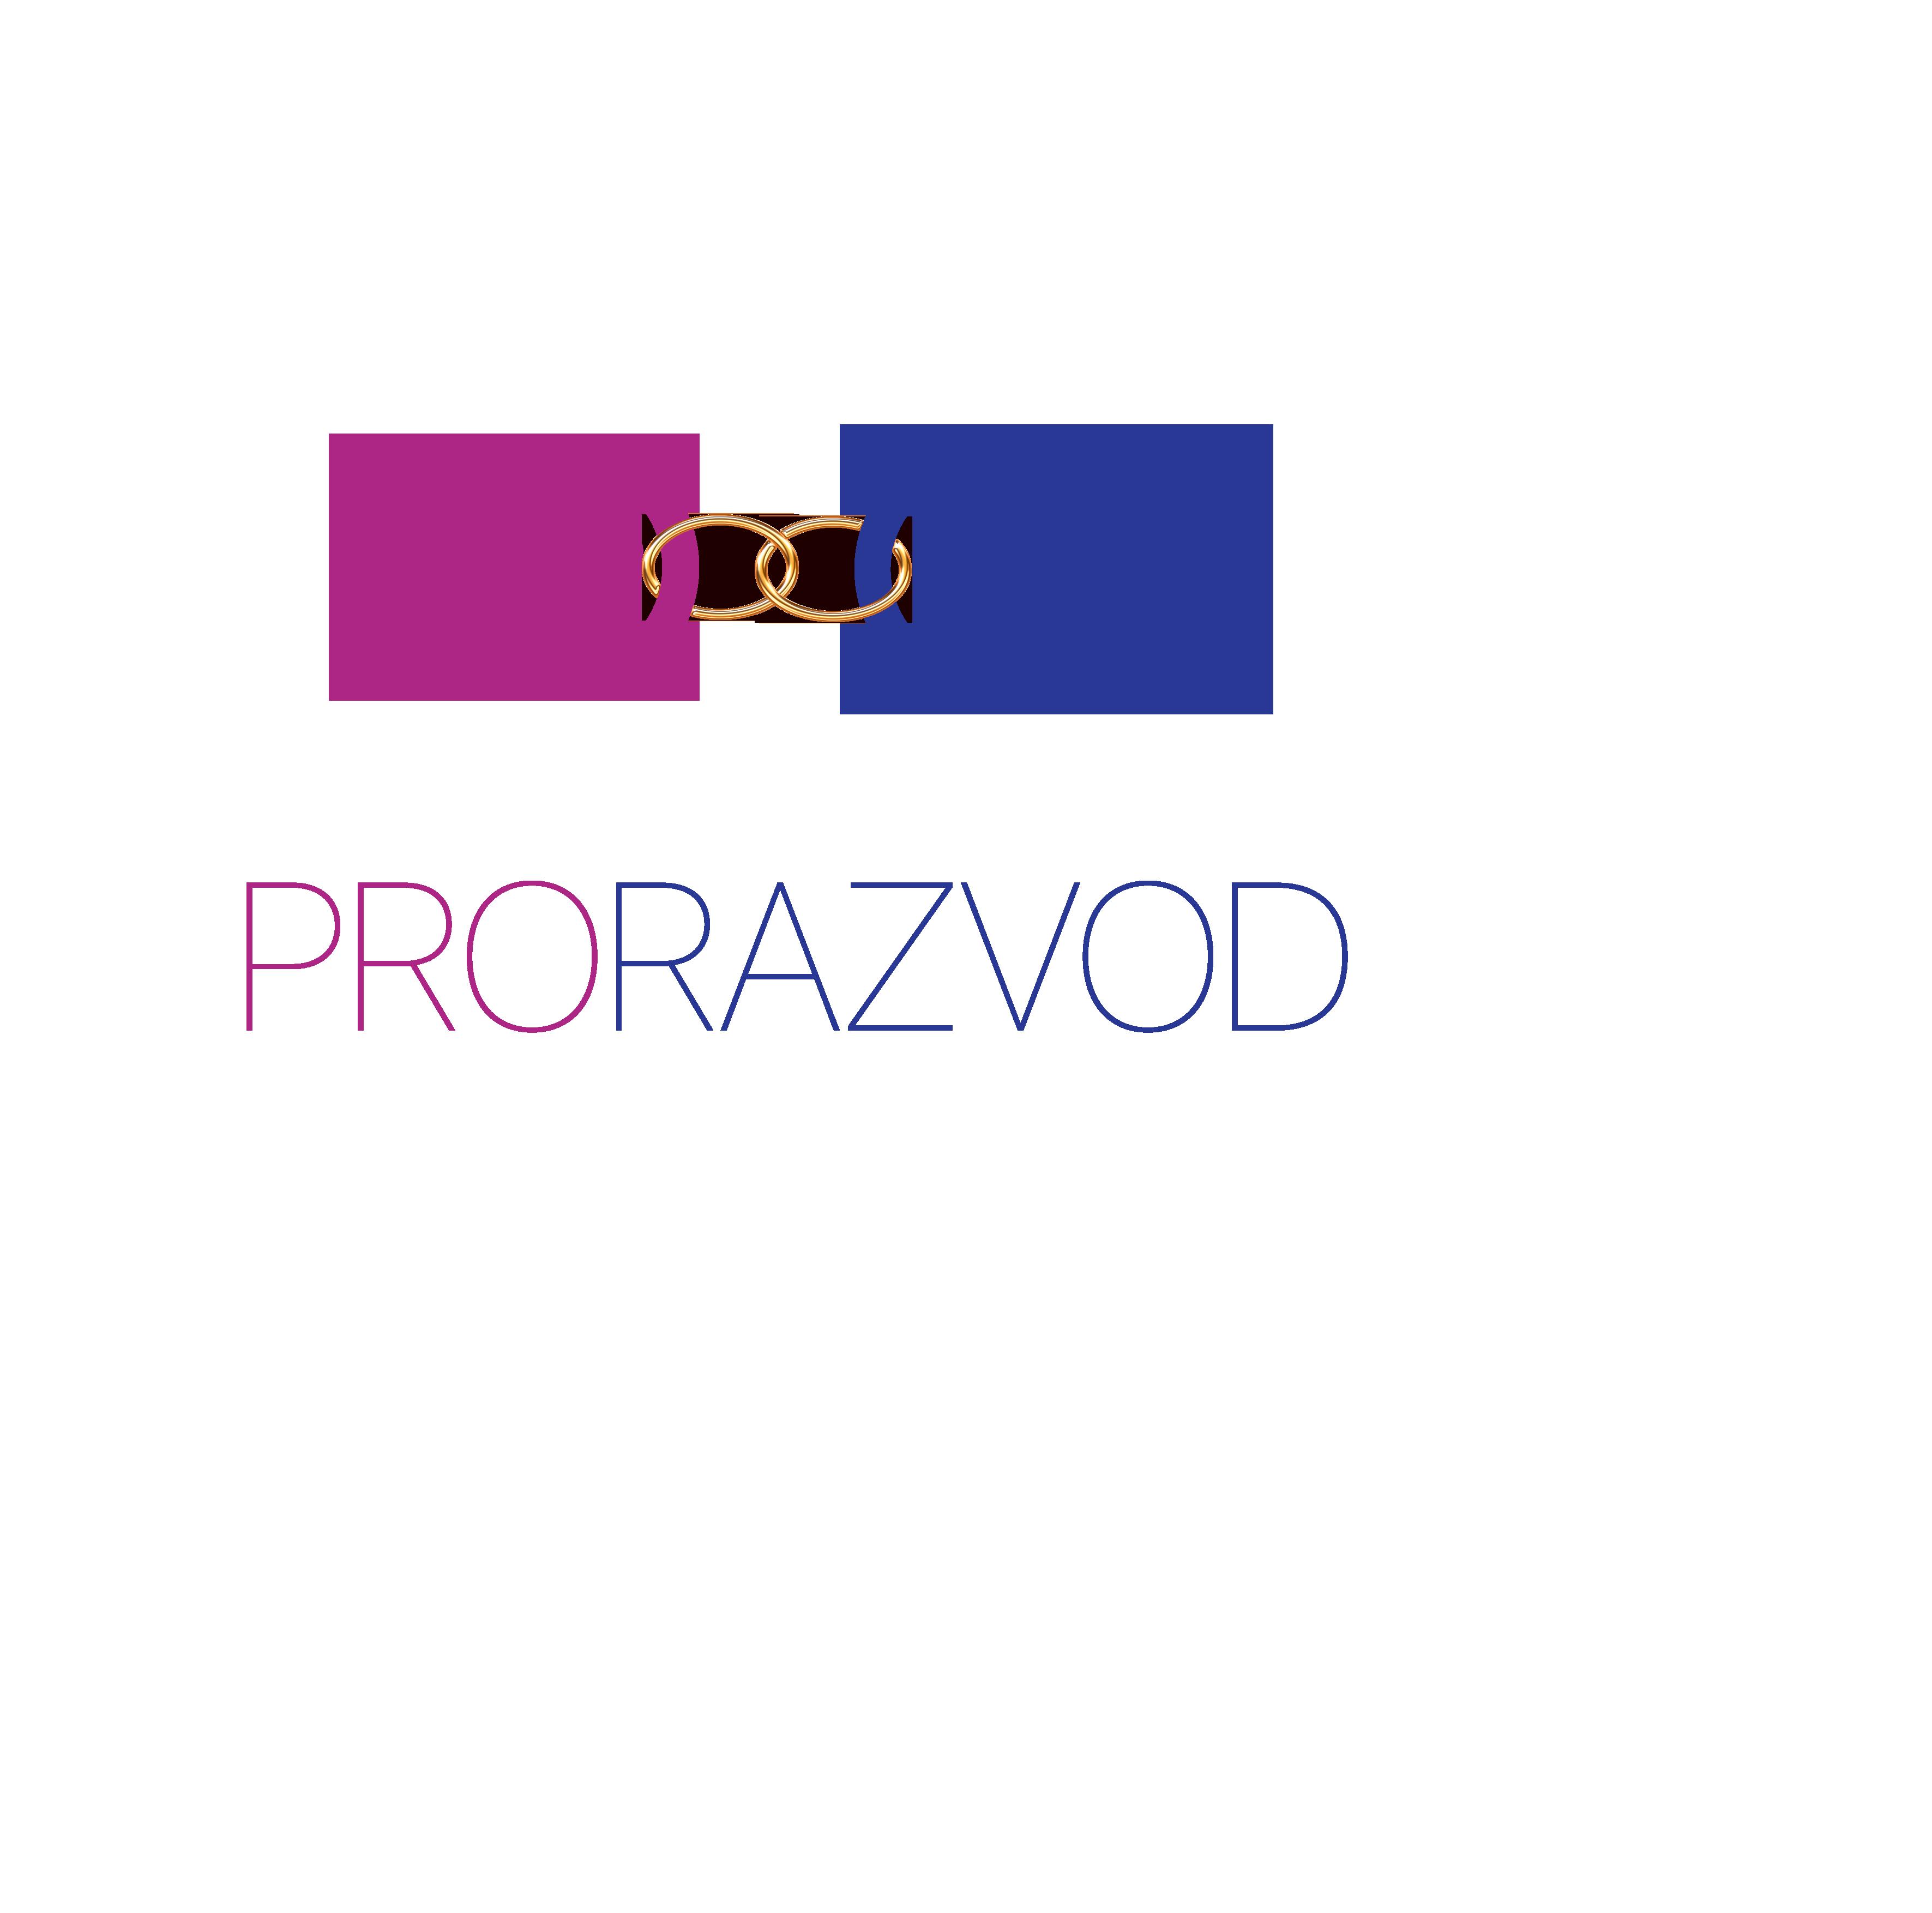 Логотип и фирм стиль для бракоразводного агенства. фото f_44758762e2a8e829.png